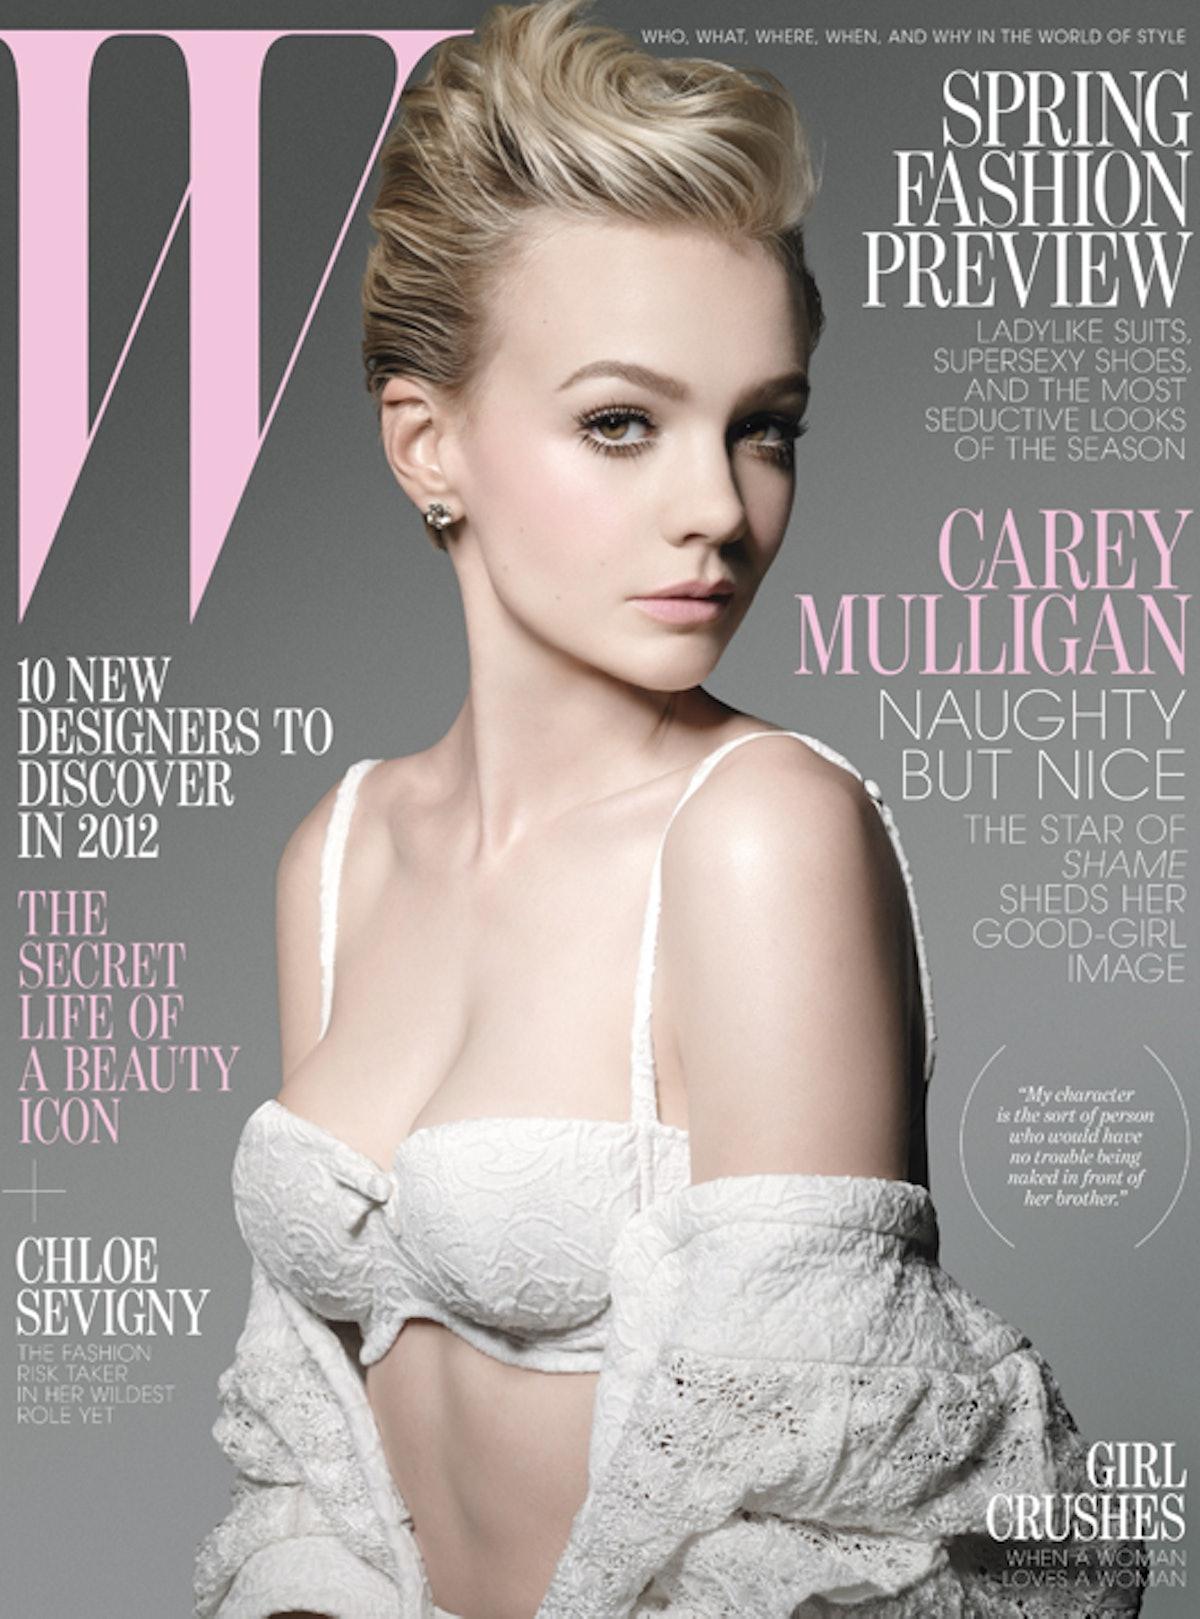 cess-carey-mulligan-shame-cover-story-06-l.jpg